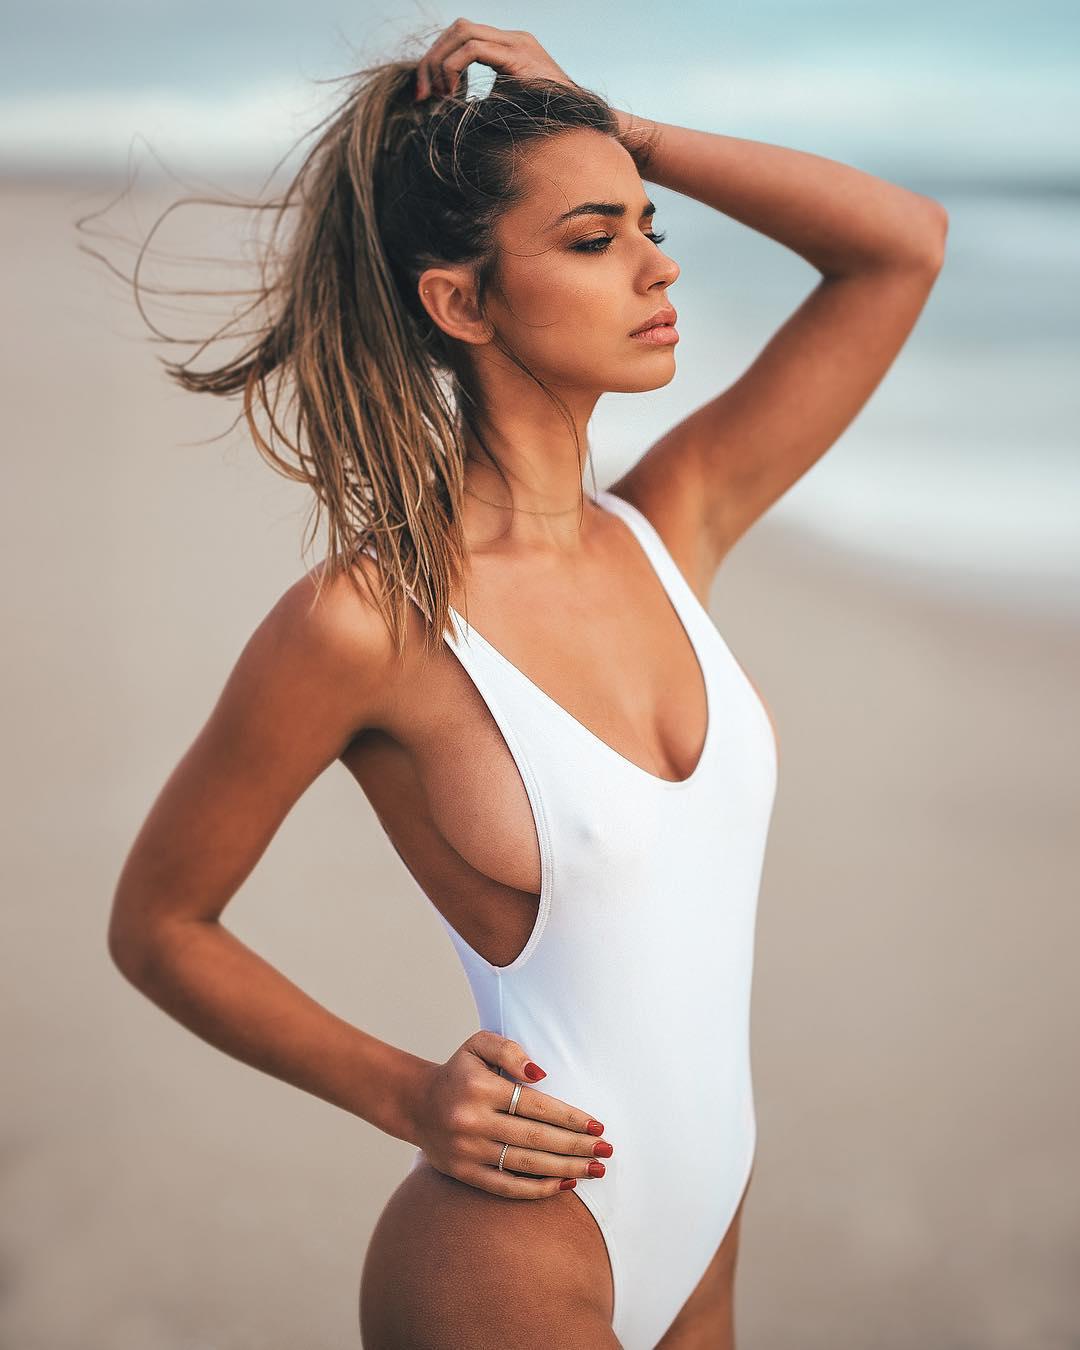 Paparazzi Olivia Pollock nudes (34 photo), Tits, Sideboobs, Twitter, in bikini 2019